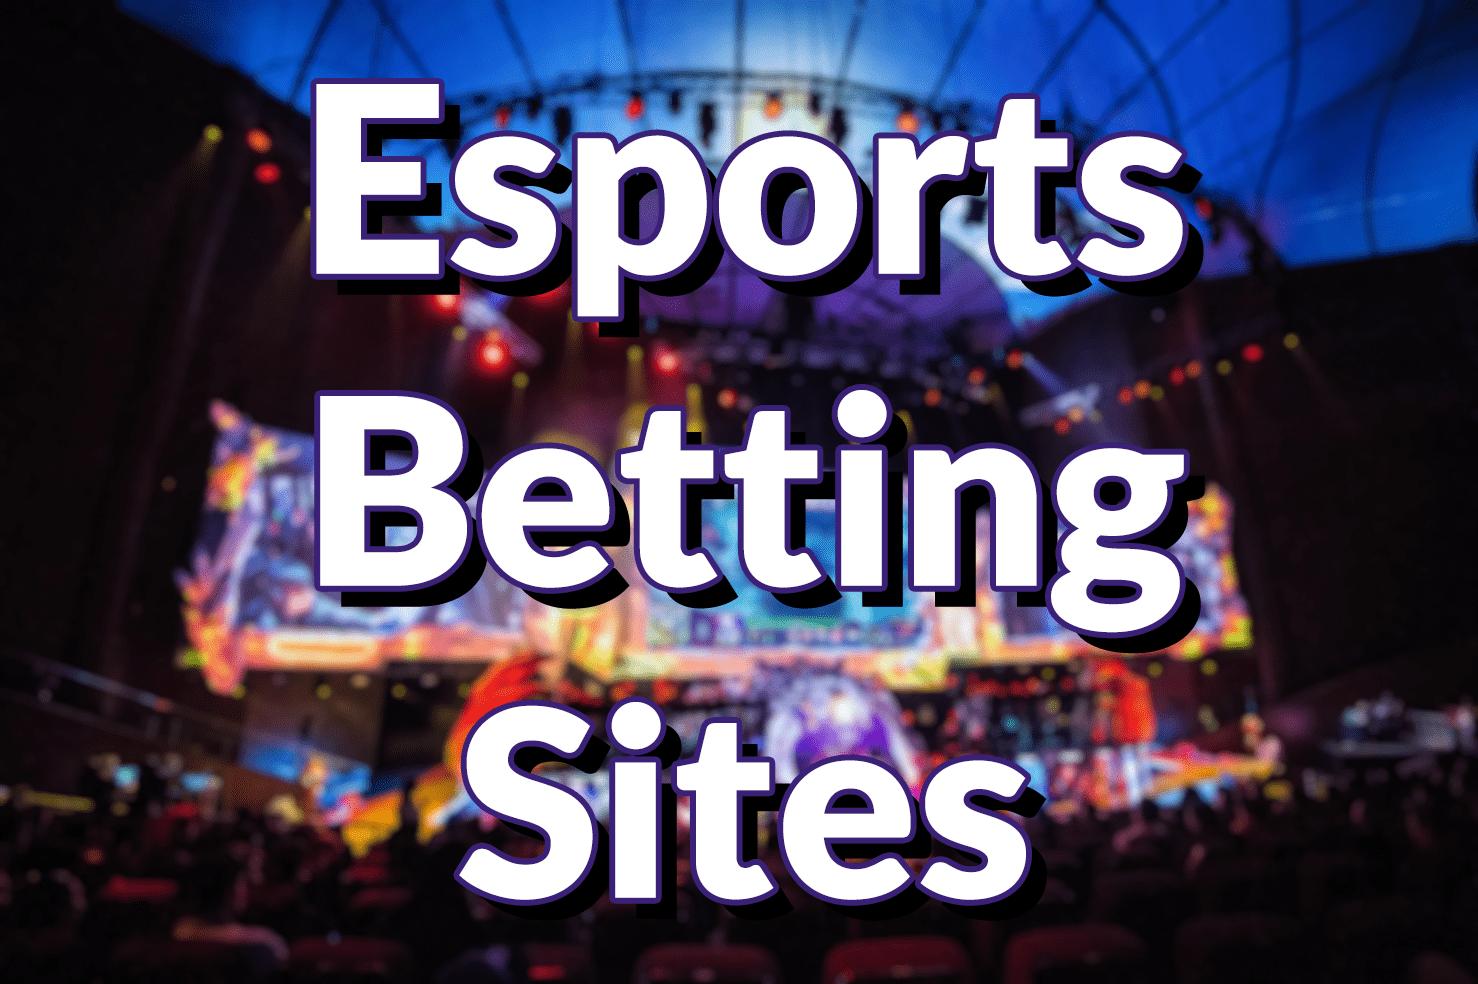 Best Esports Betting Sites